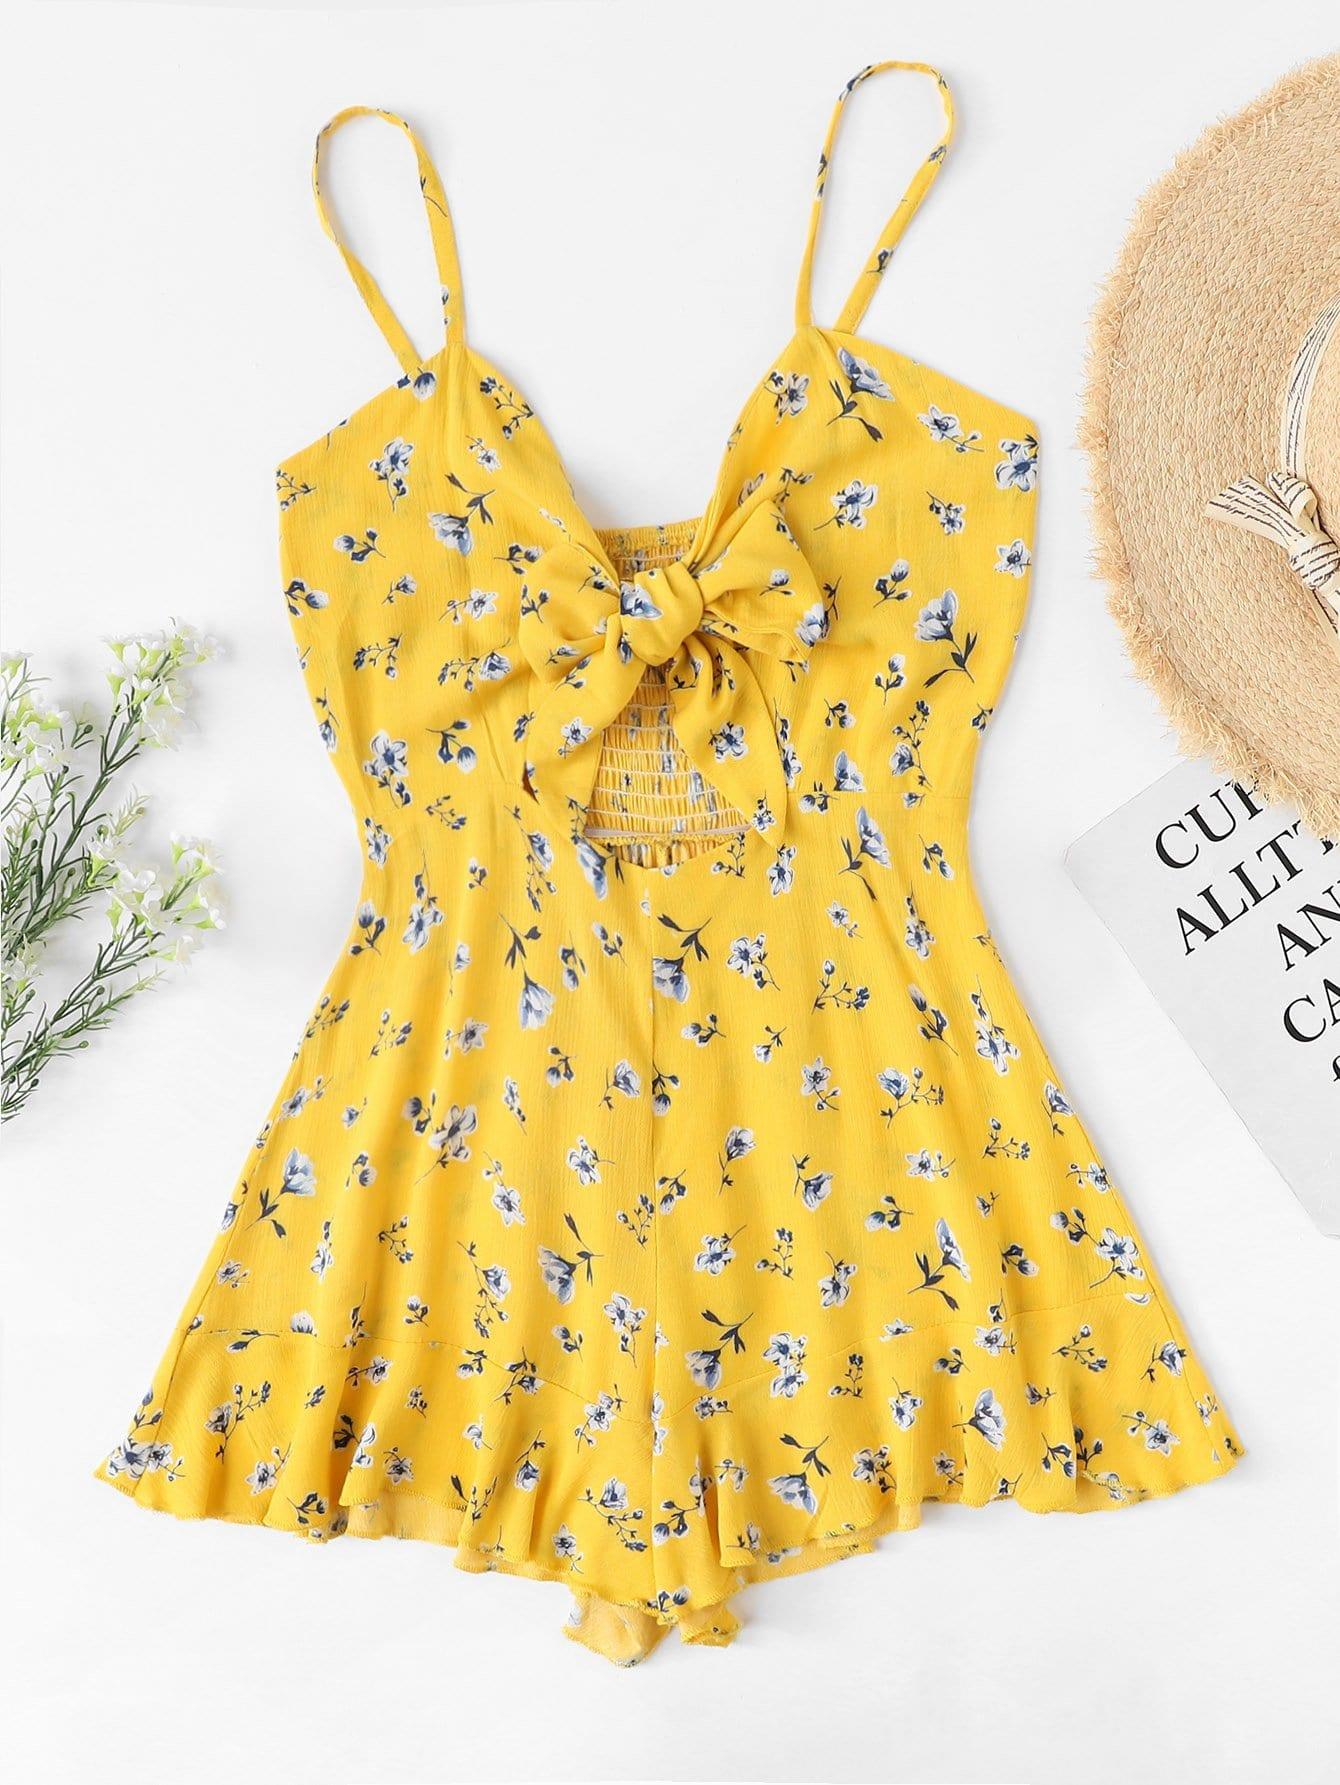 Отпускнойстиль Со цветочками с бантом Желтый Комбинезон